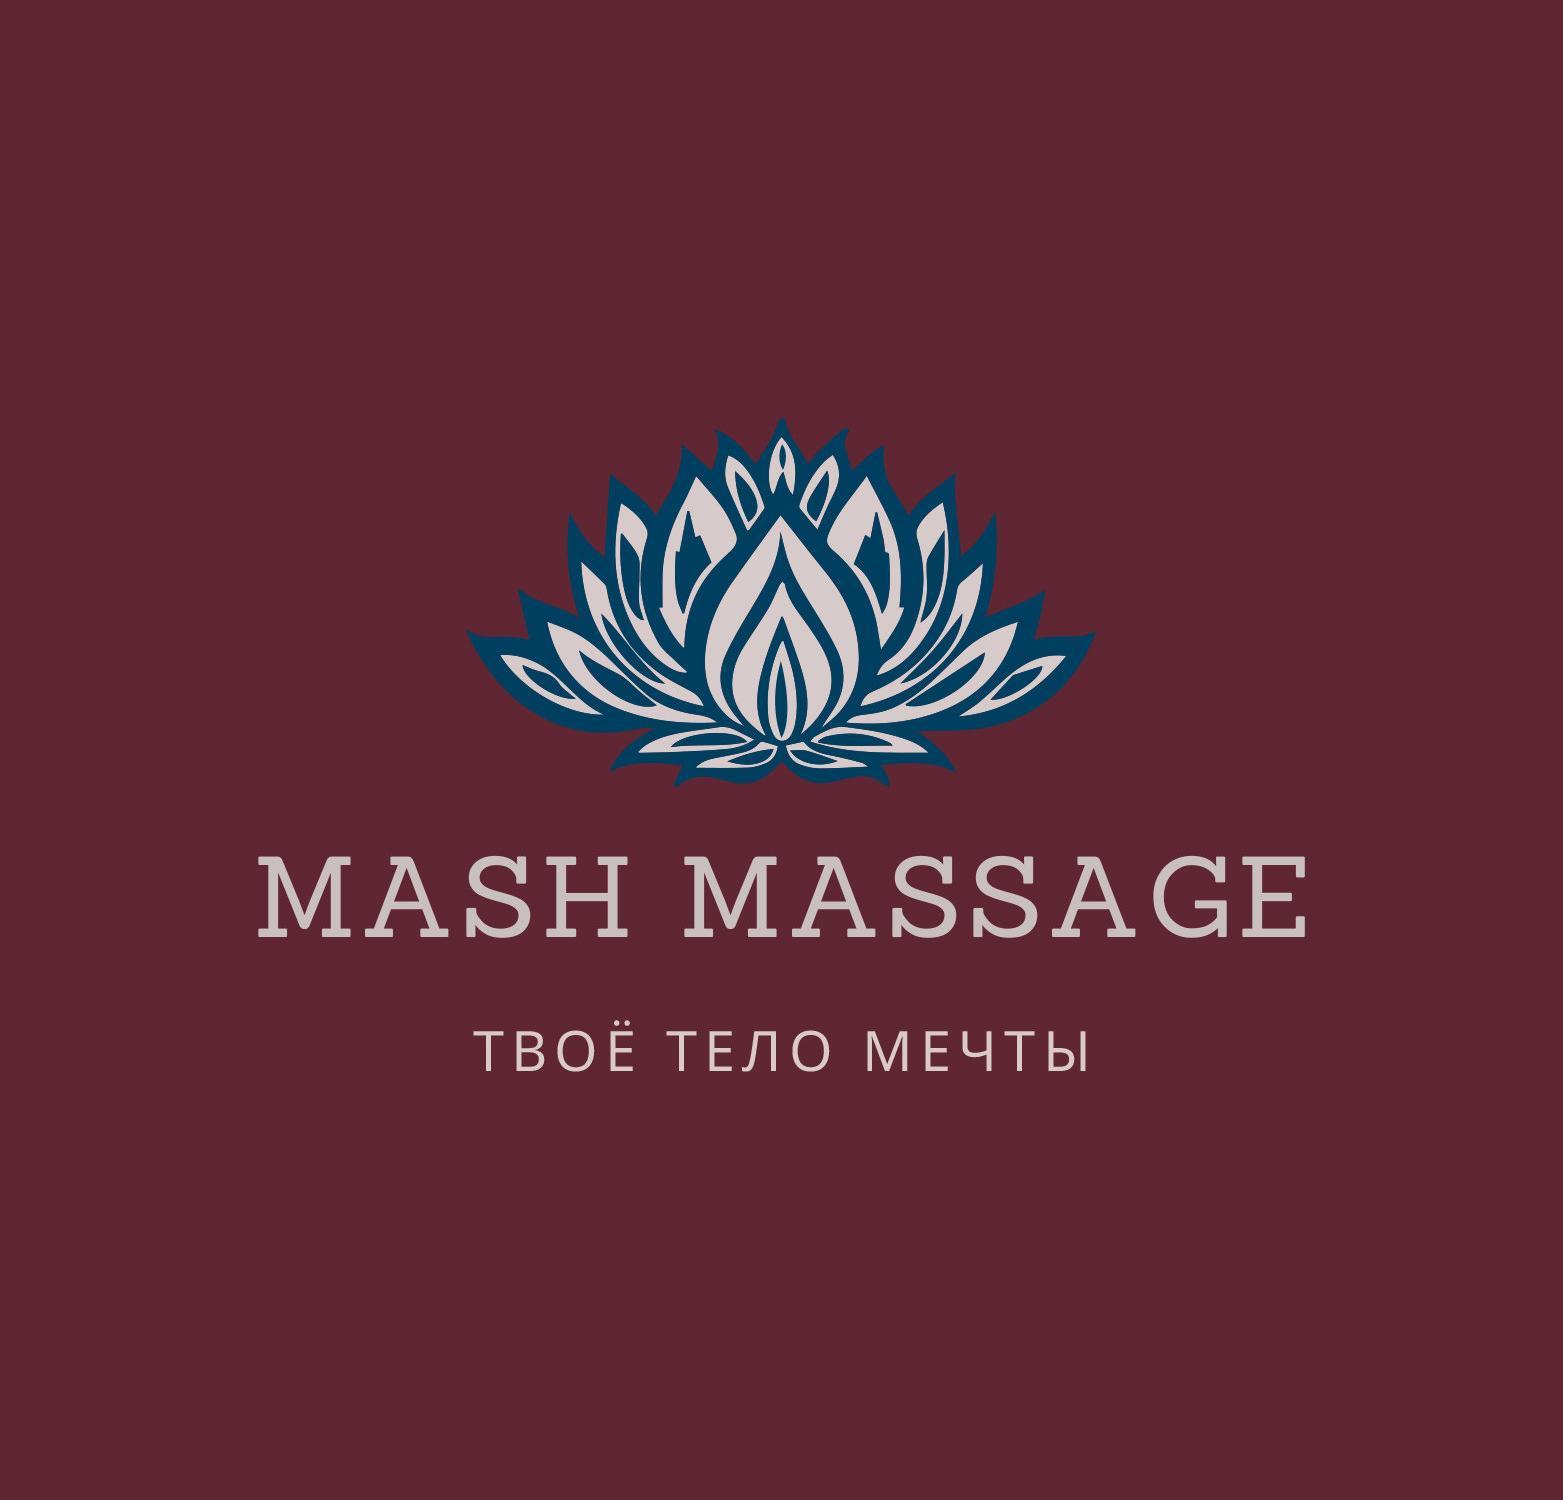 Mash Massage Spb